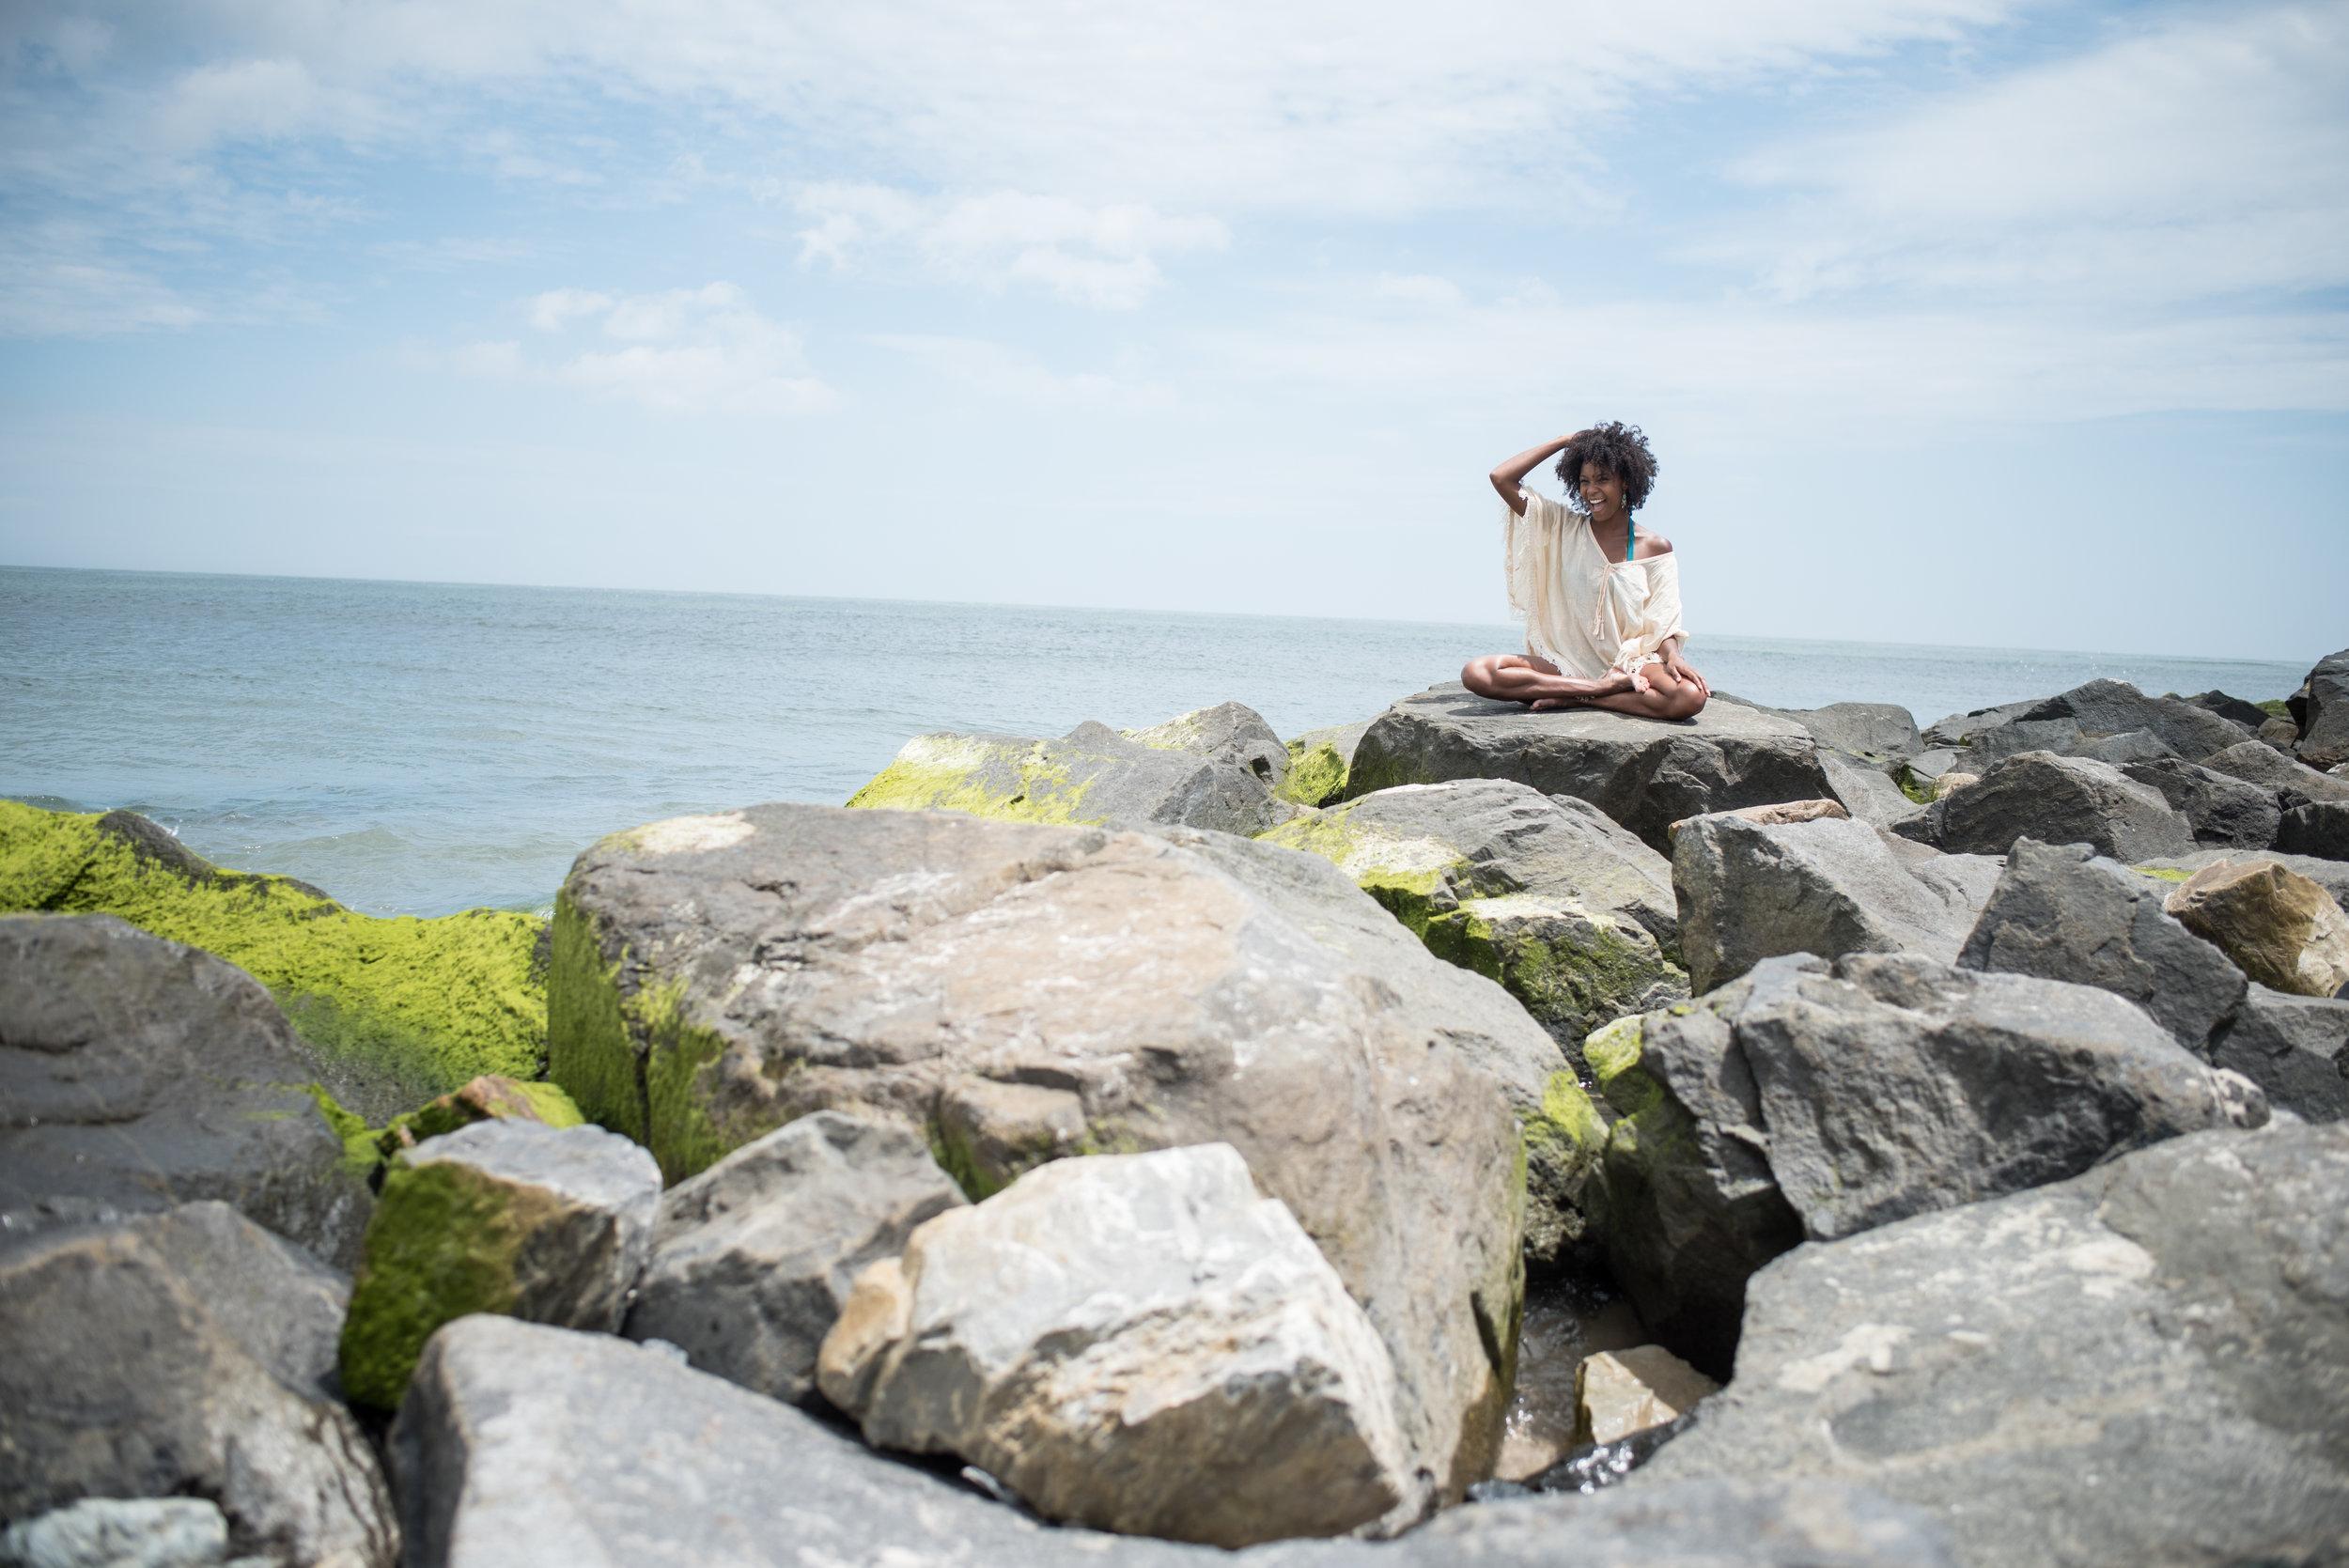 Seaside Shaman